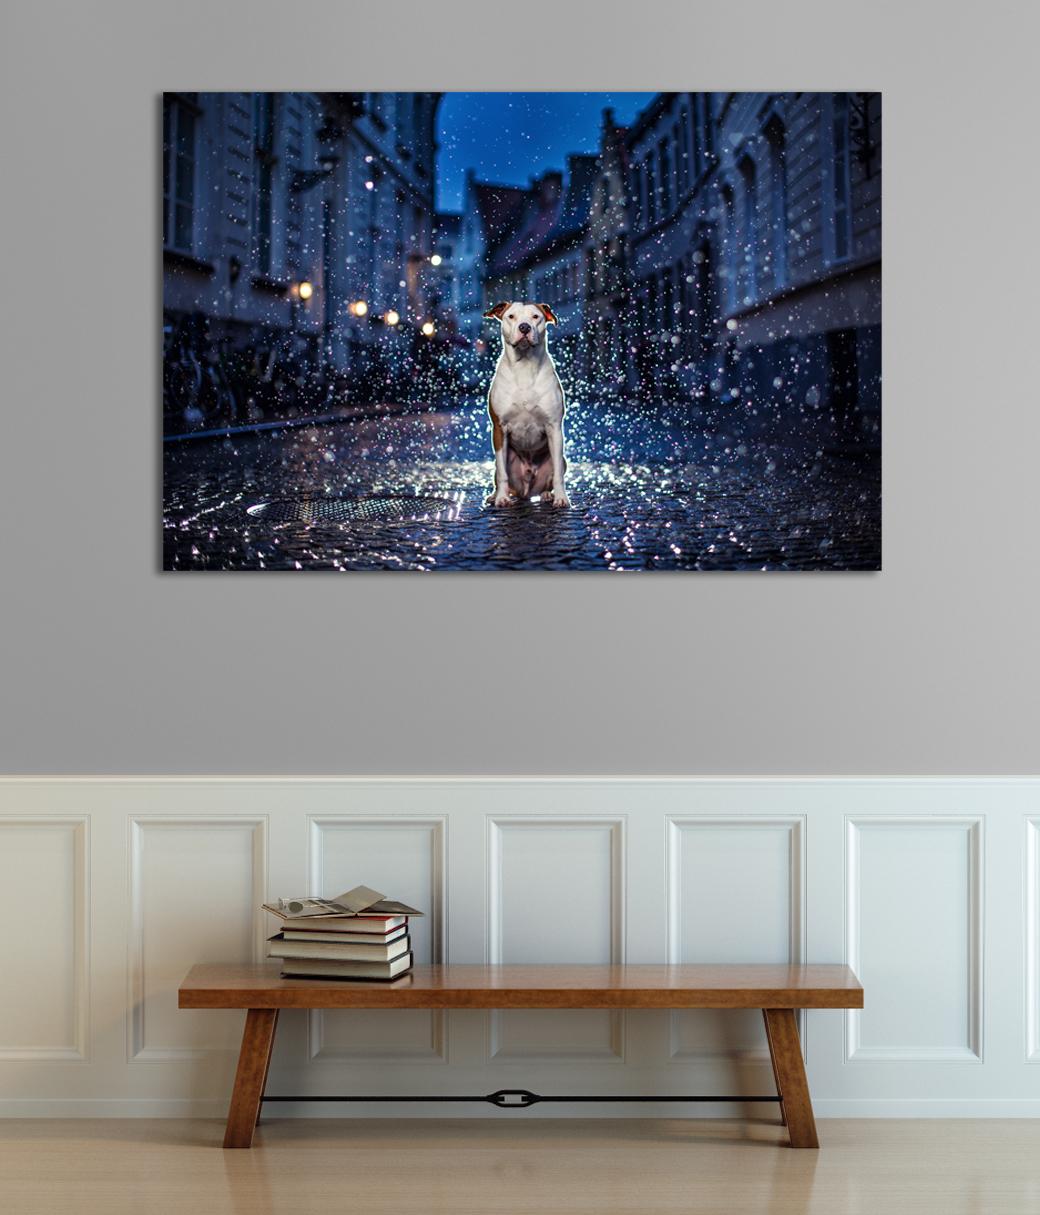 bobby-rain-on-wall.jpg